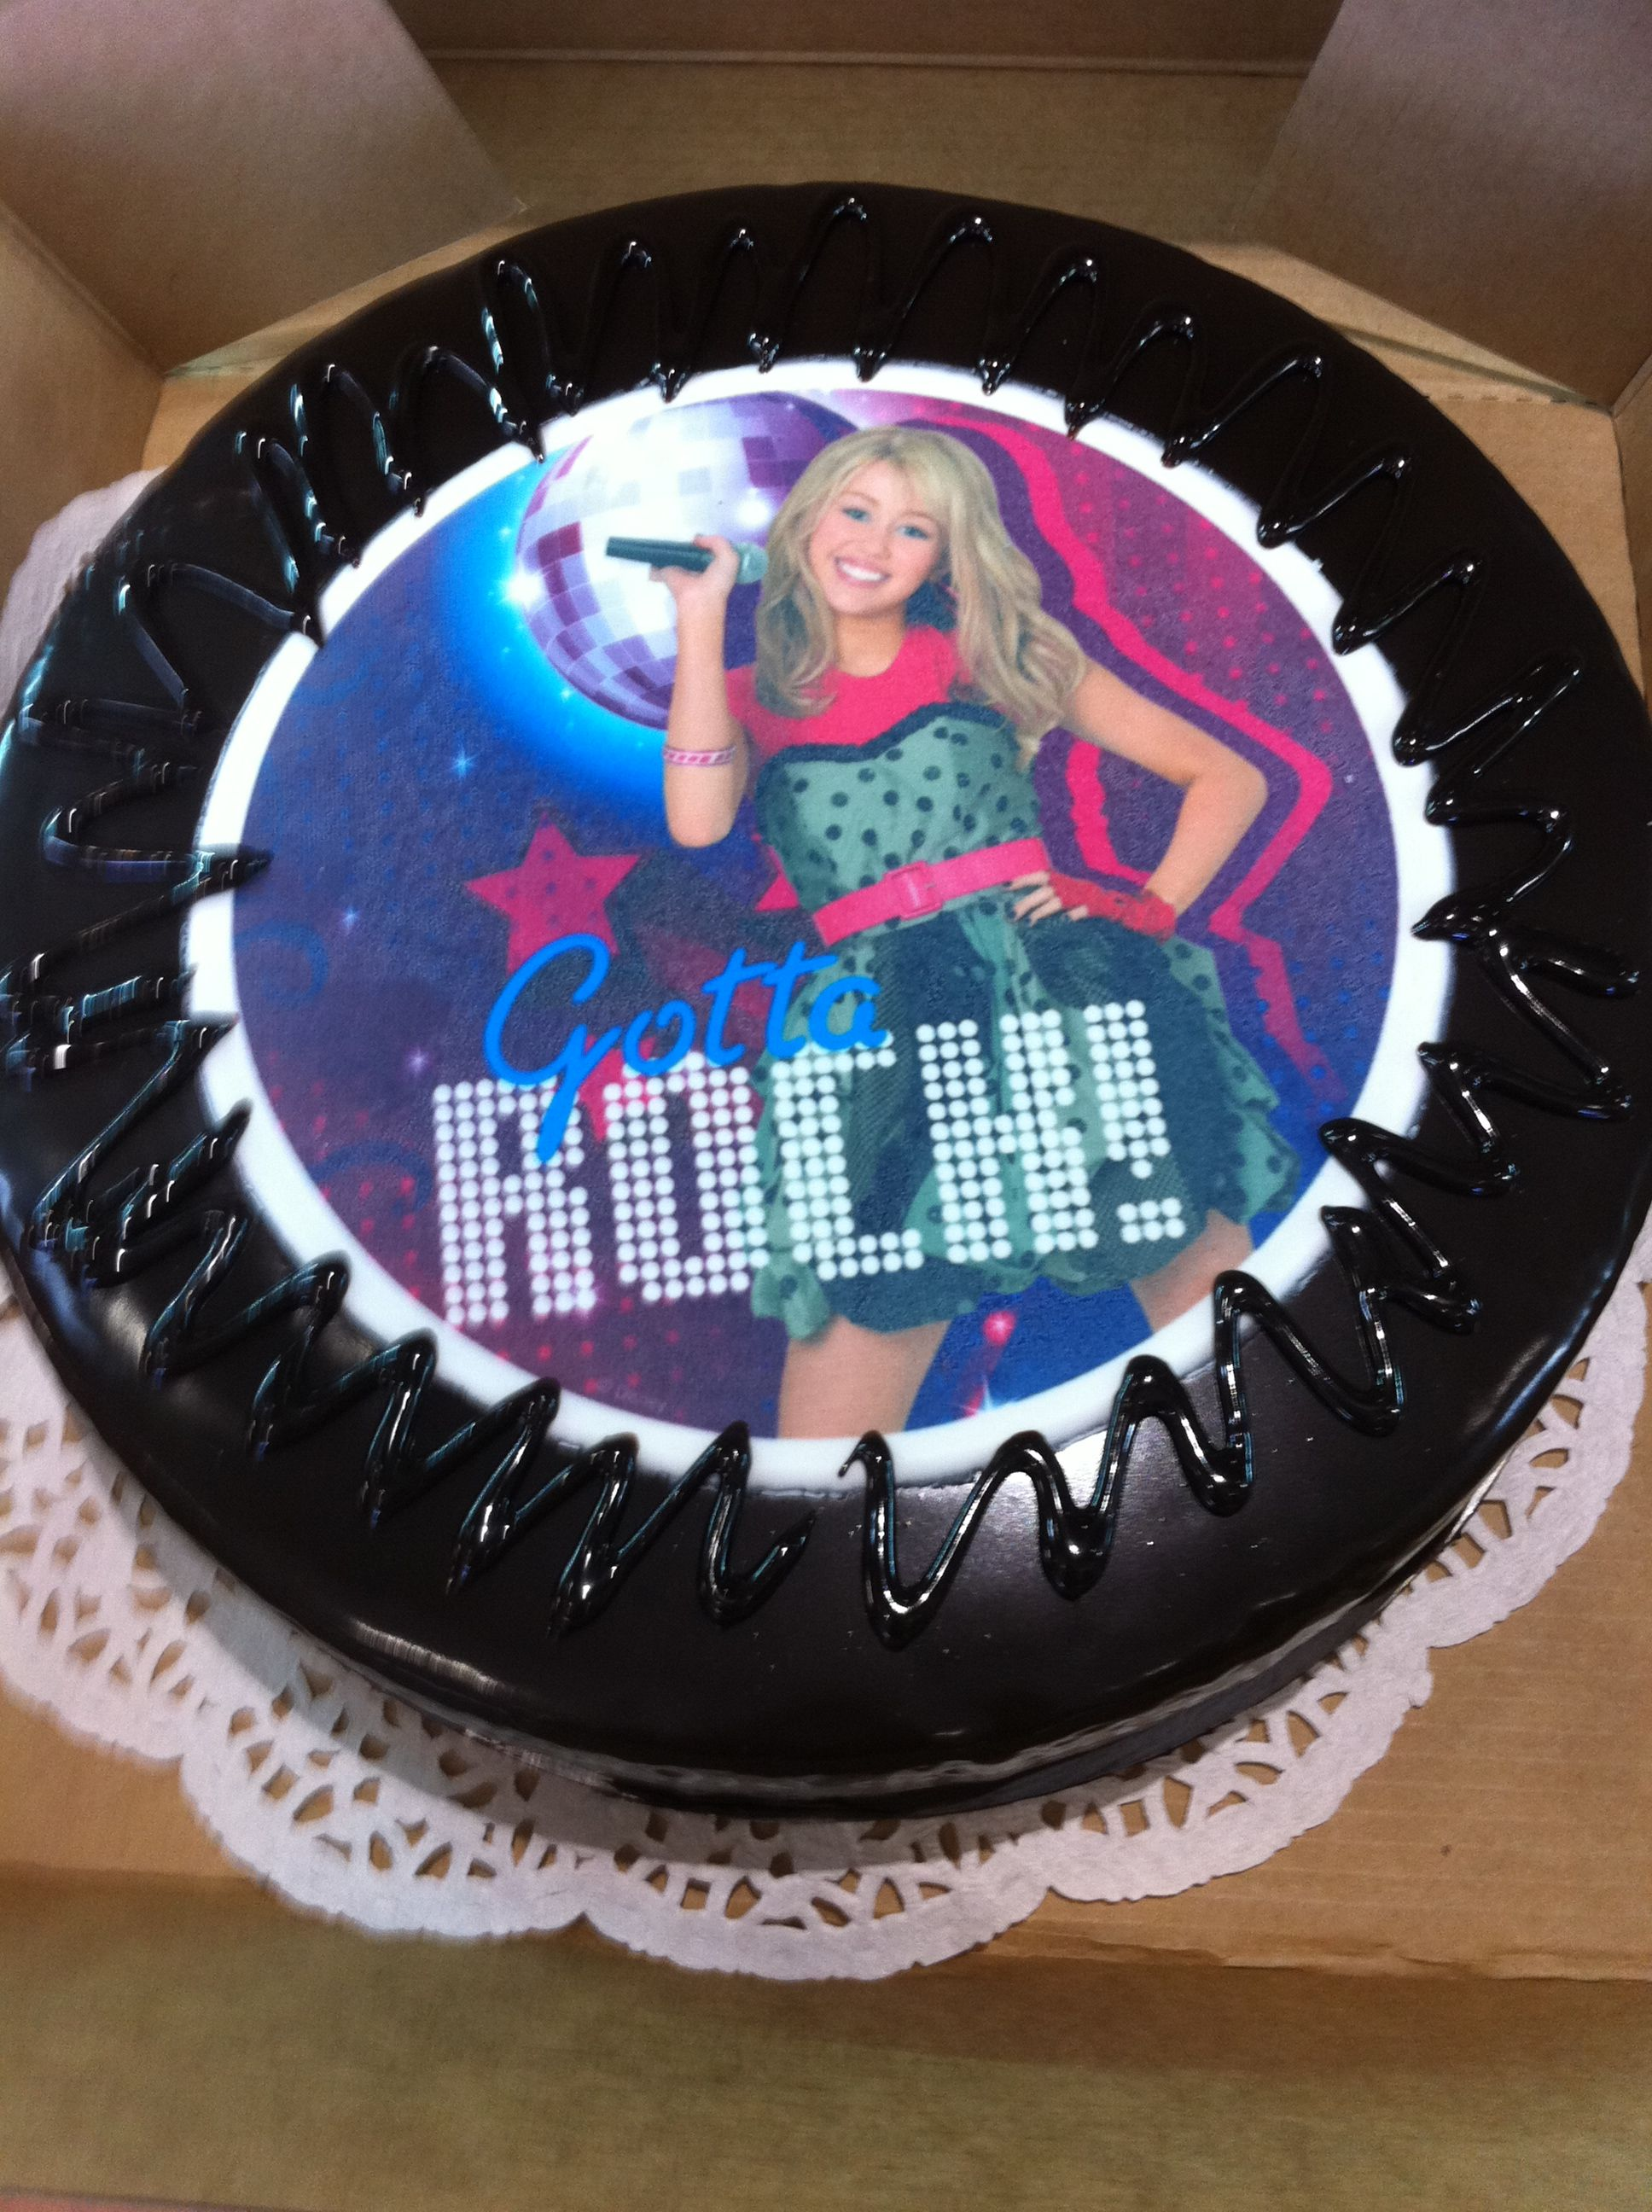 Outstanding Hannah Montana Birthday Cake Birthday Cake Birthday Cards Printable Inklcafe Filternl